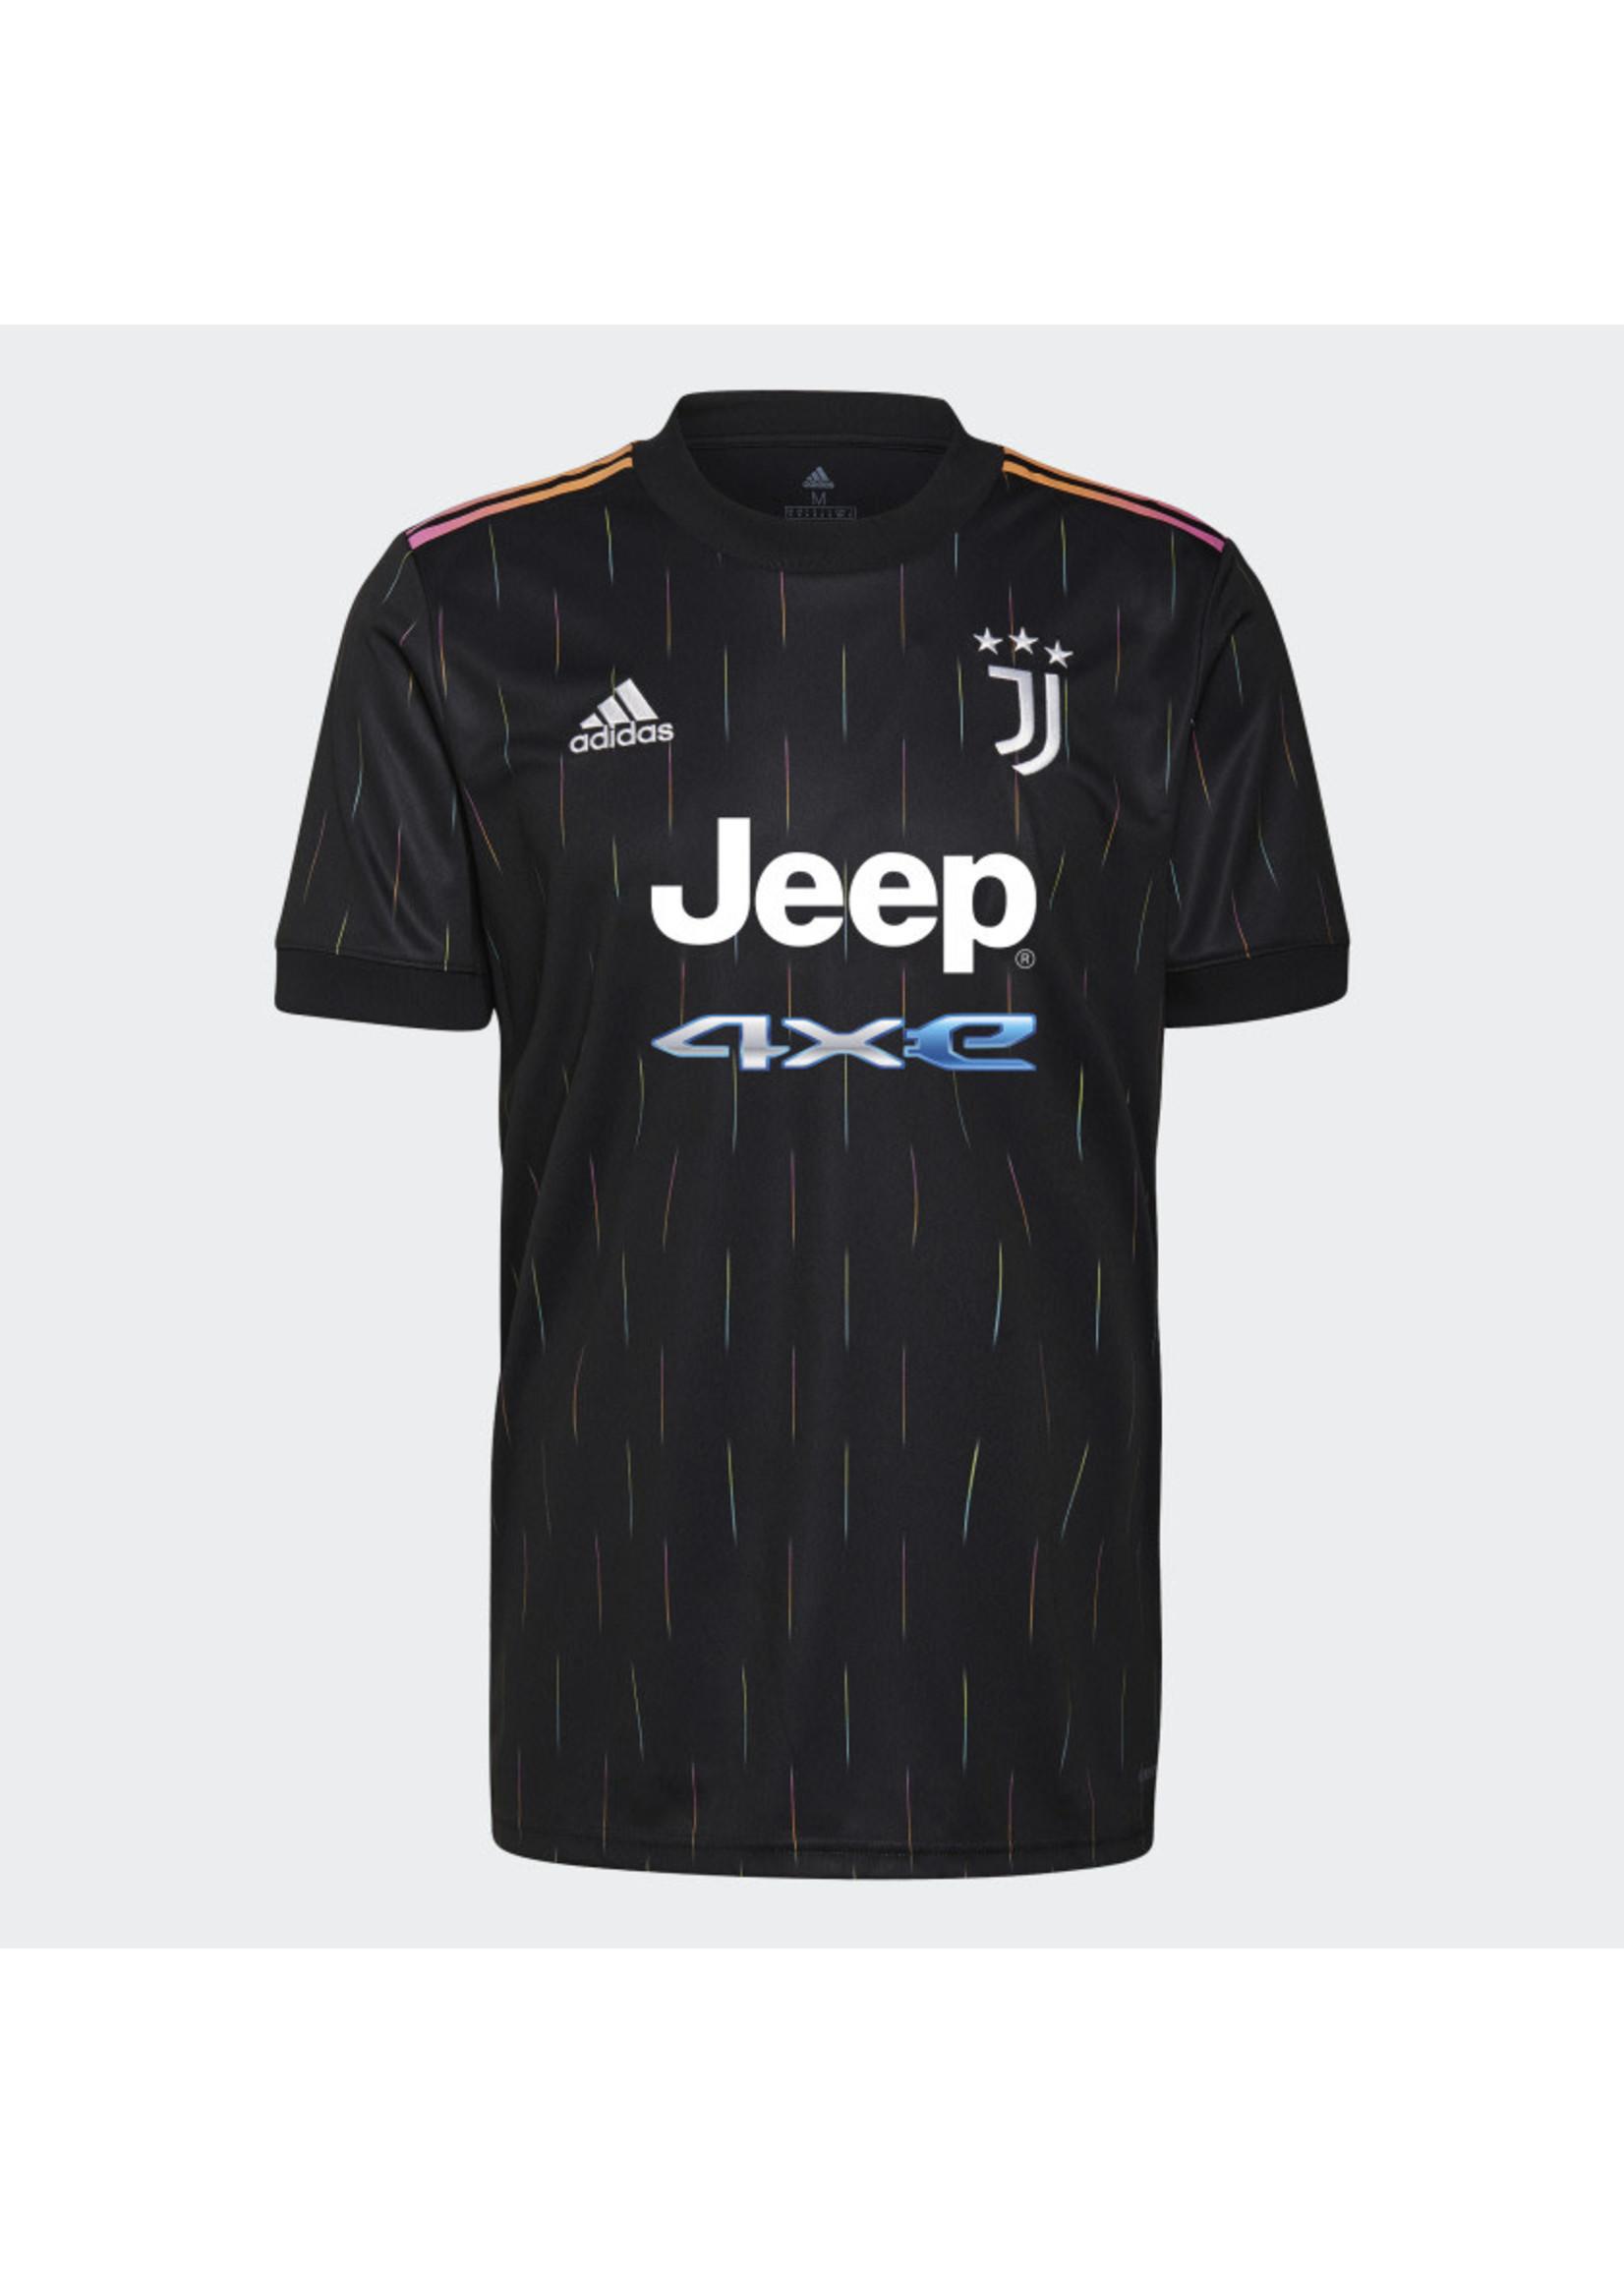 Adidas JUVENTUS AWAY JERSEY 2021/22